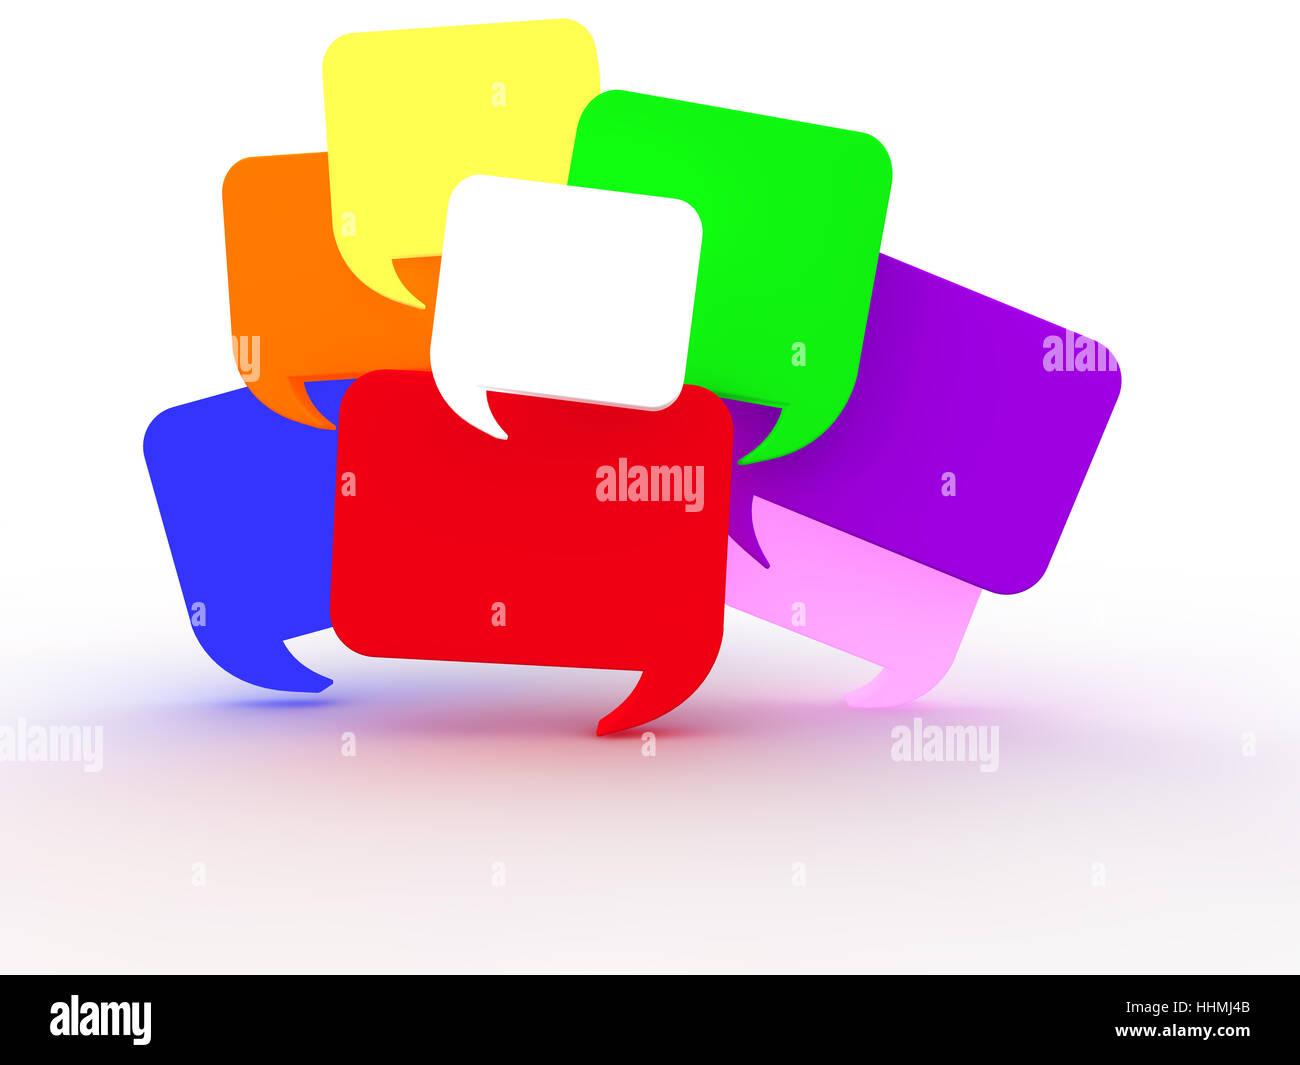 conversation, talk, speaking, speaks, spoken, speak, talking, chat, nattering, Stock Photo